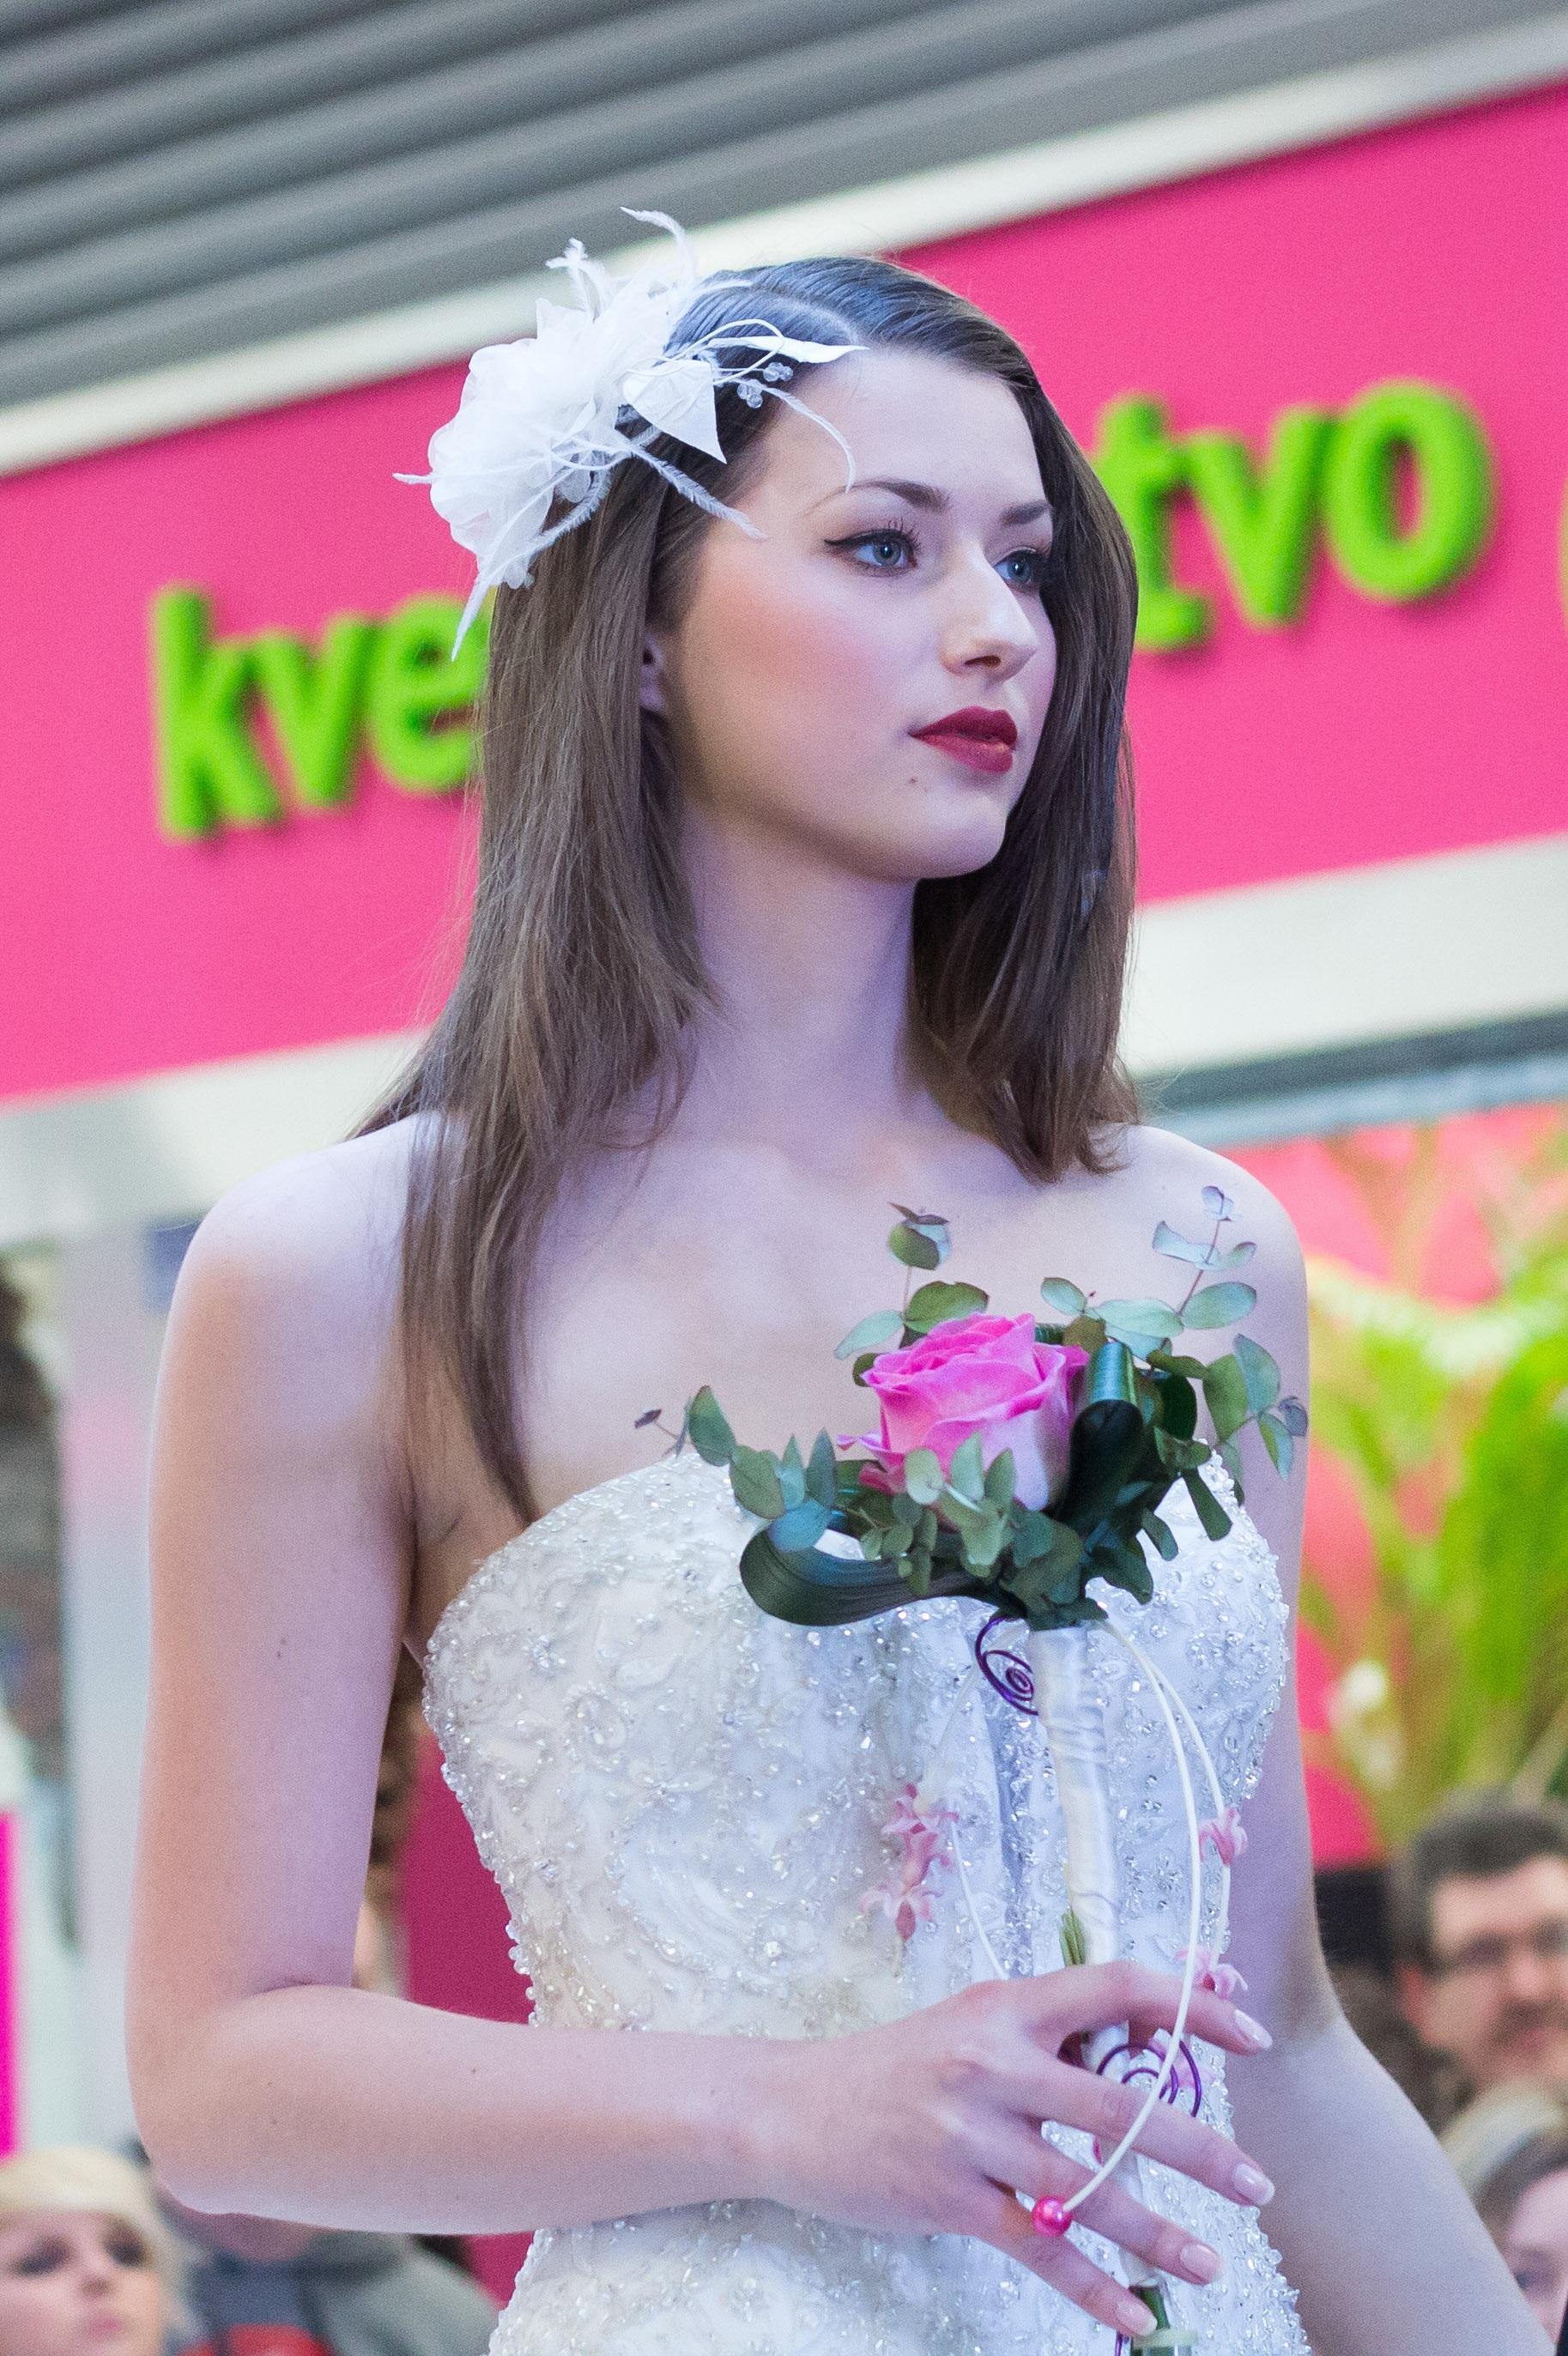 Kostenlose foto : Mädchen, Frau, Modell-, Mode, Kleidung, Dame, Rosa ...